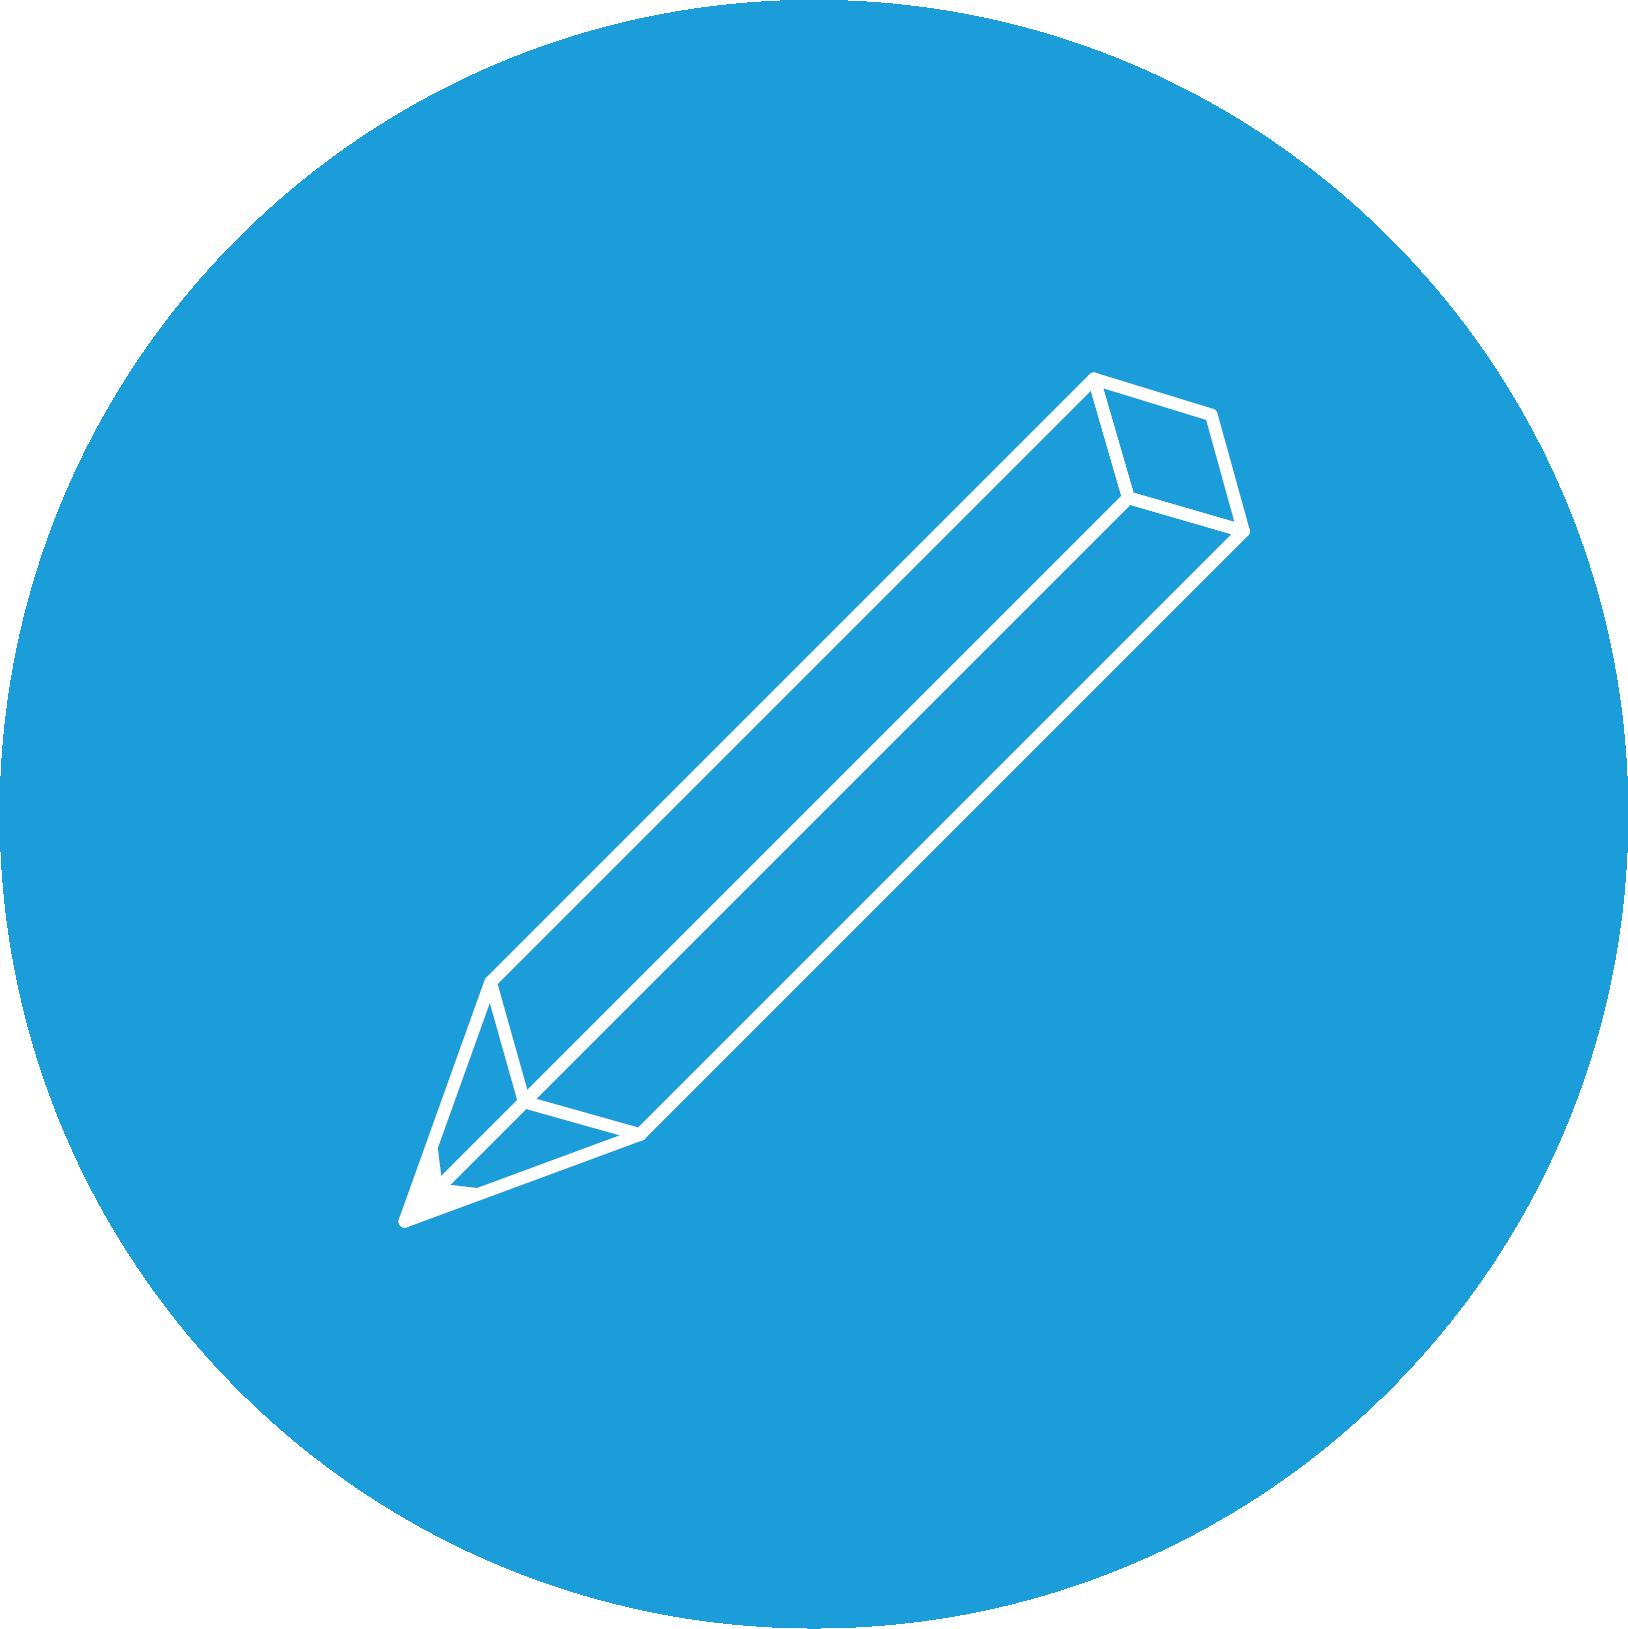 Ikon som symboliserer produktudviking